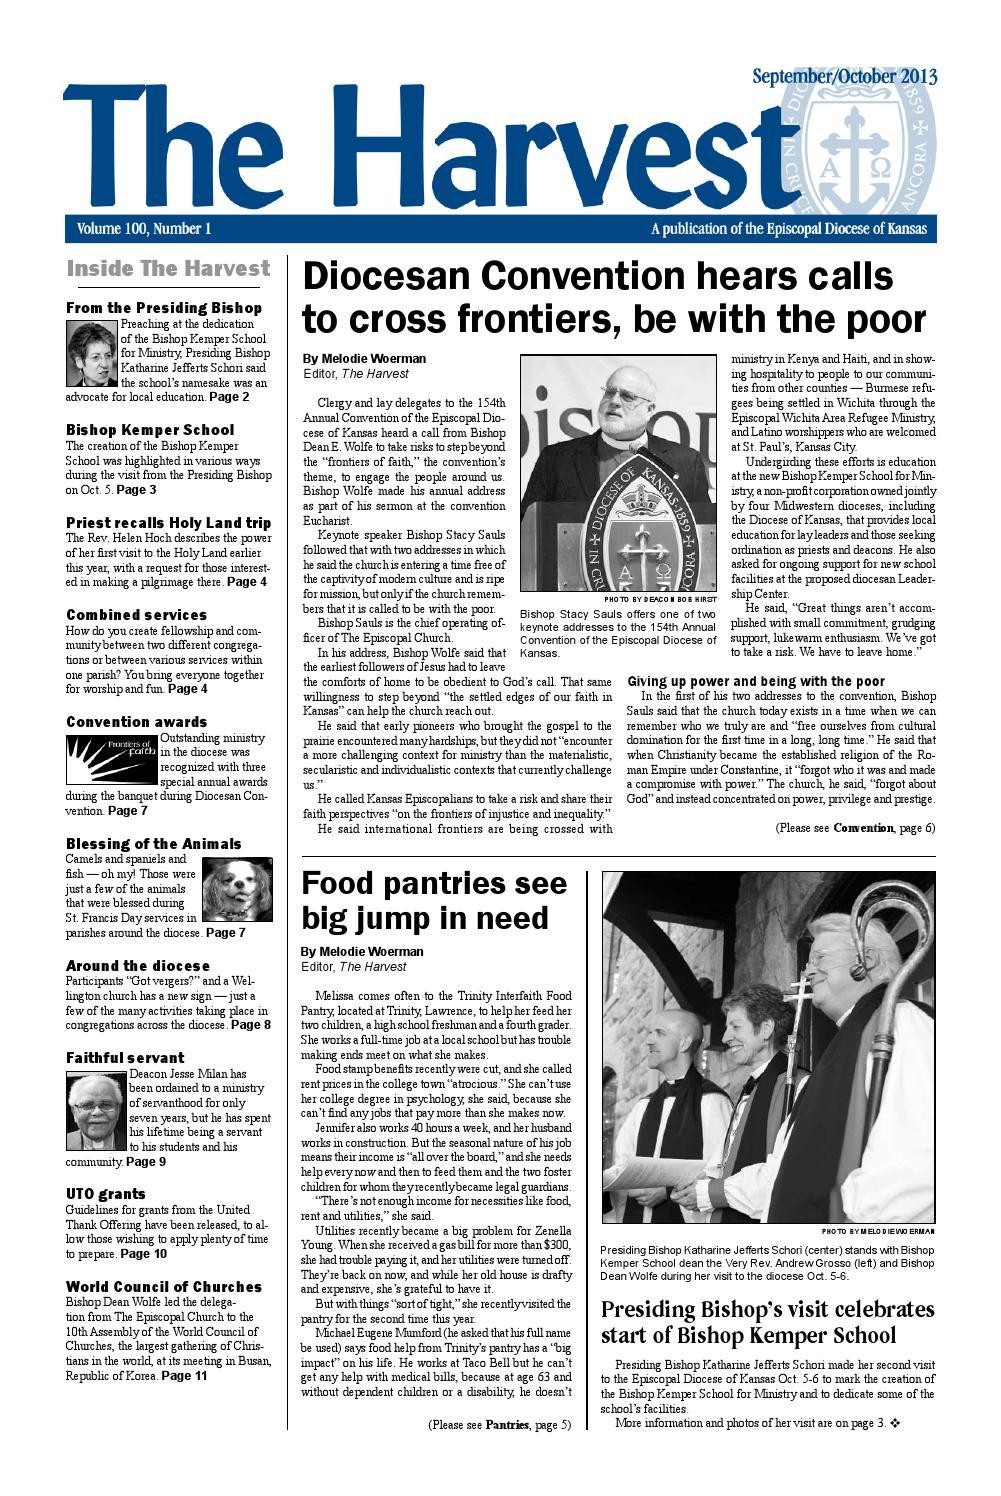 The Harvest, September-October 2013 by Episcopal Diocese of Kansas